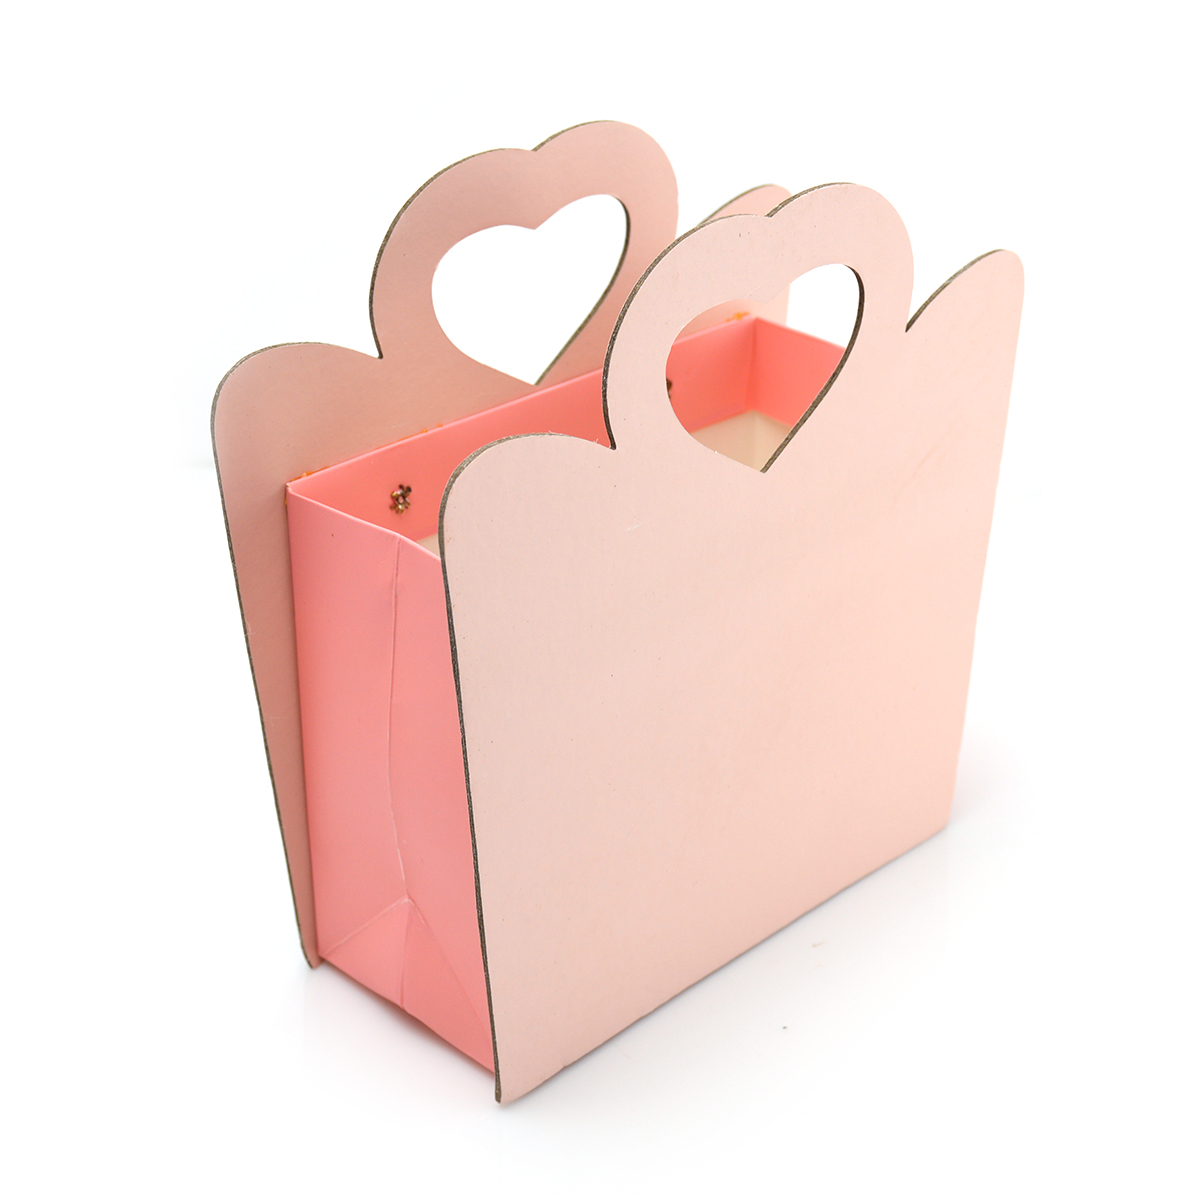 Cutie din carton pliabila maner inima laterale dure, frez